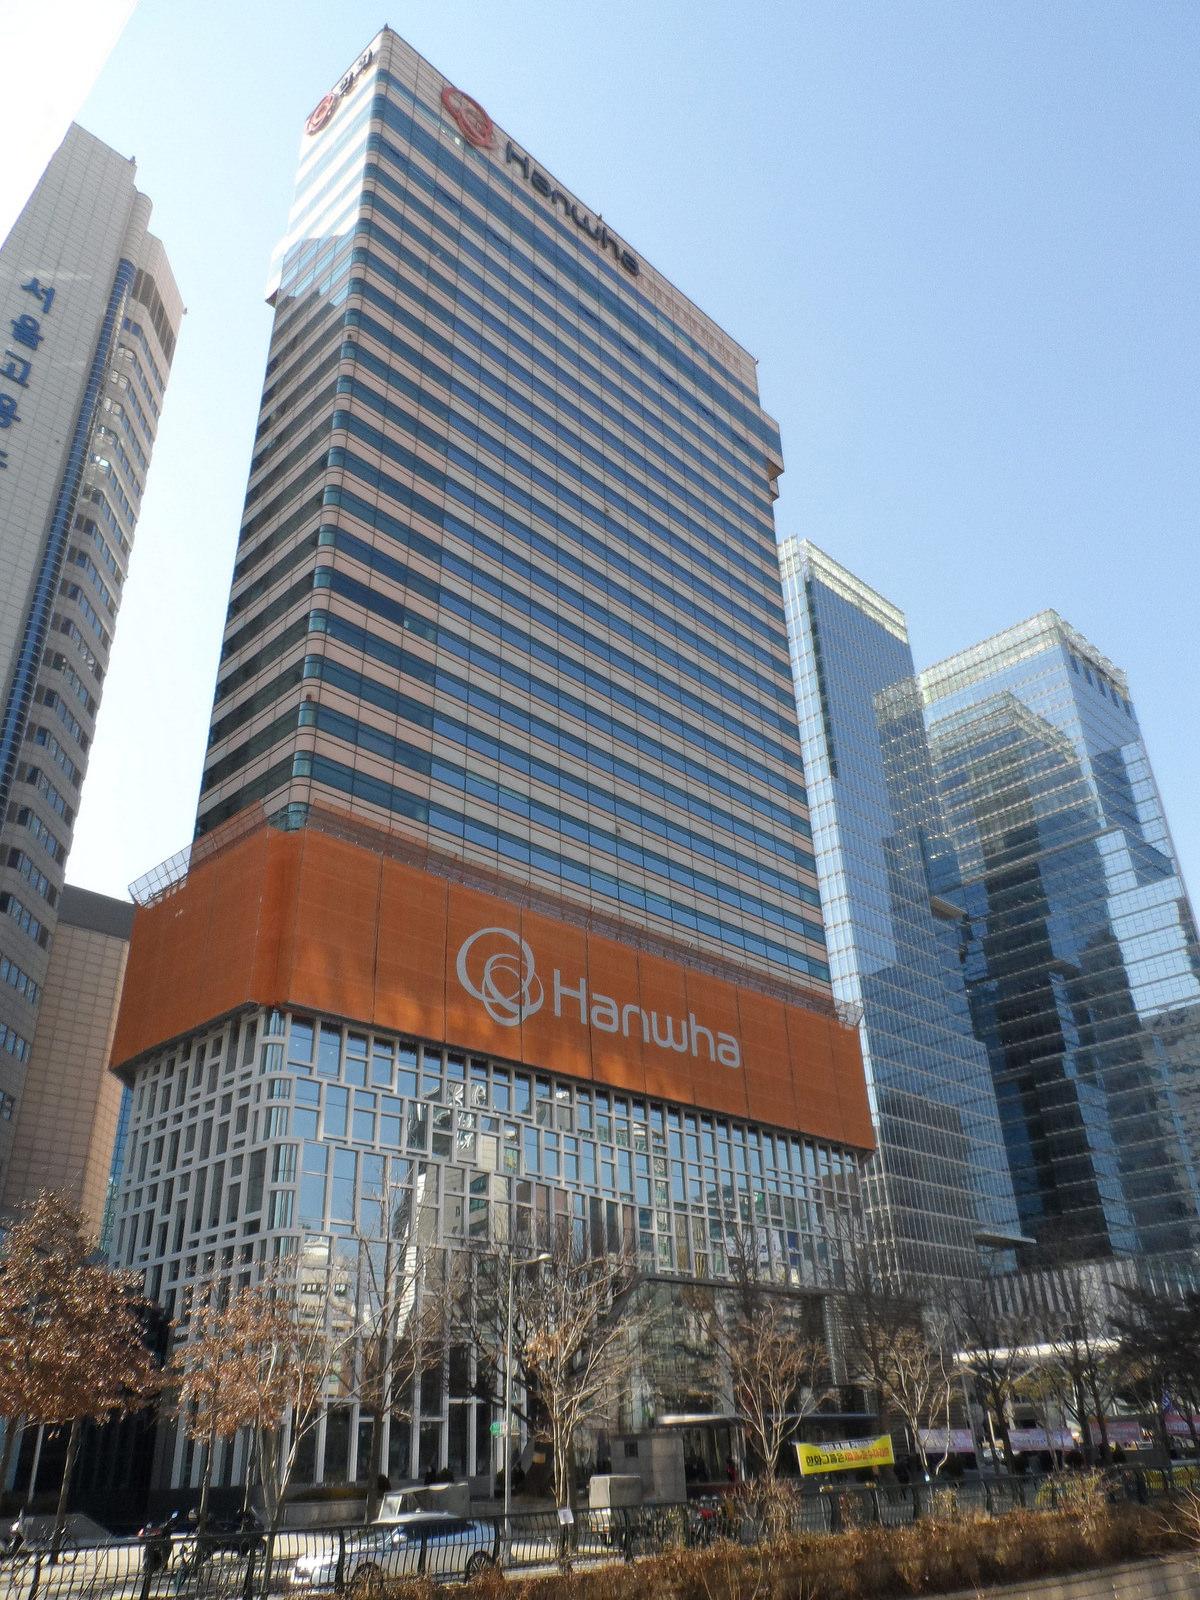 Hanwha Headquarters Remodelling Underway In Seoul